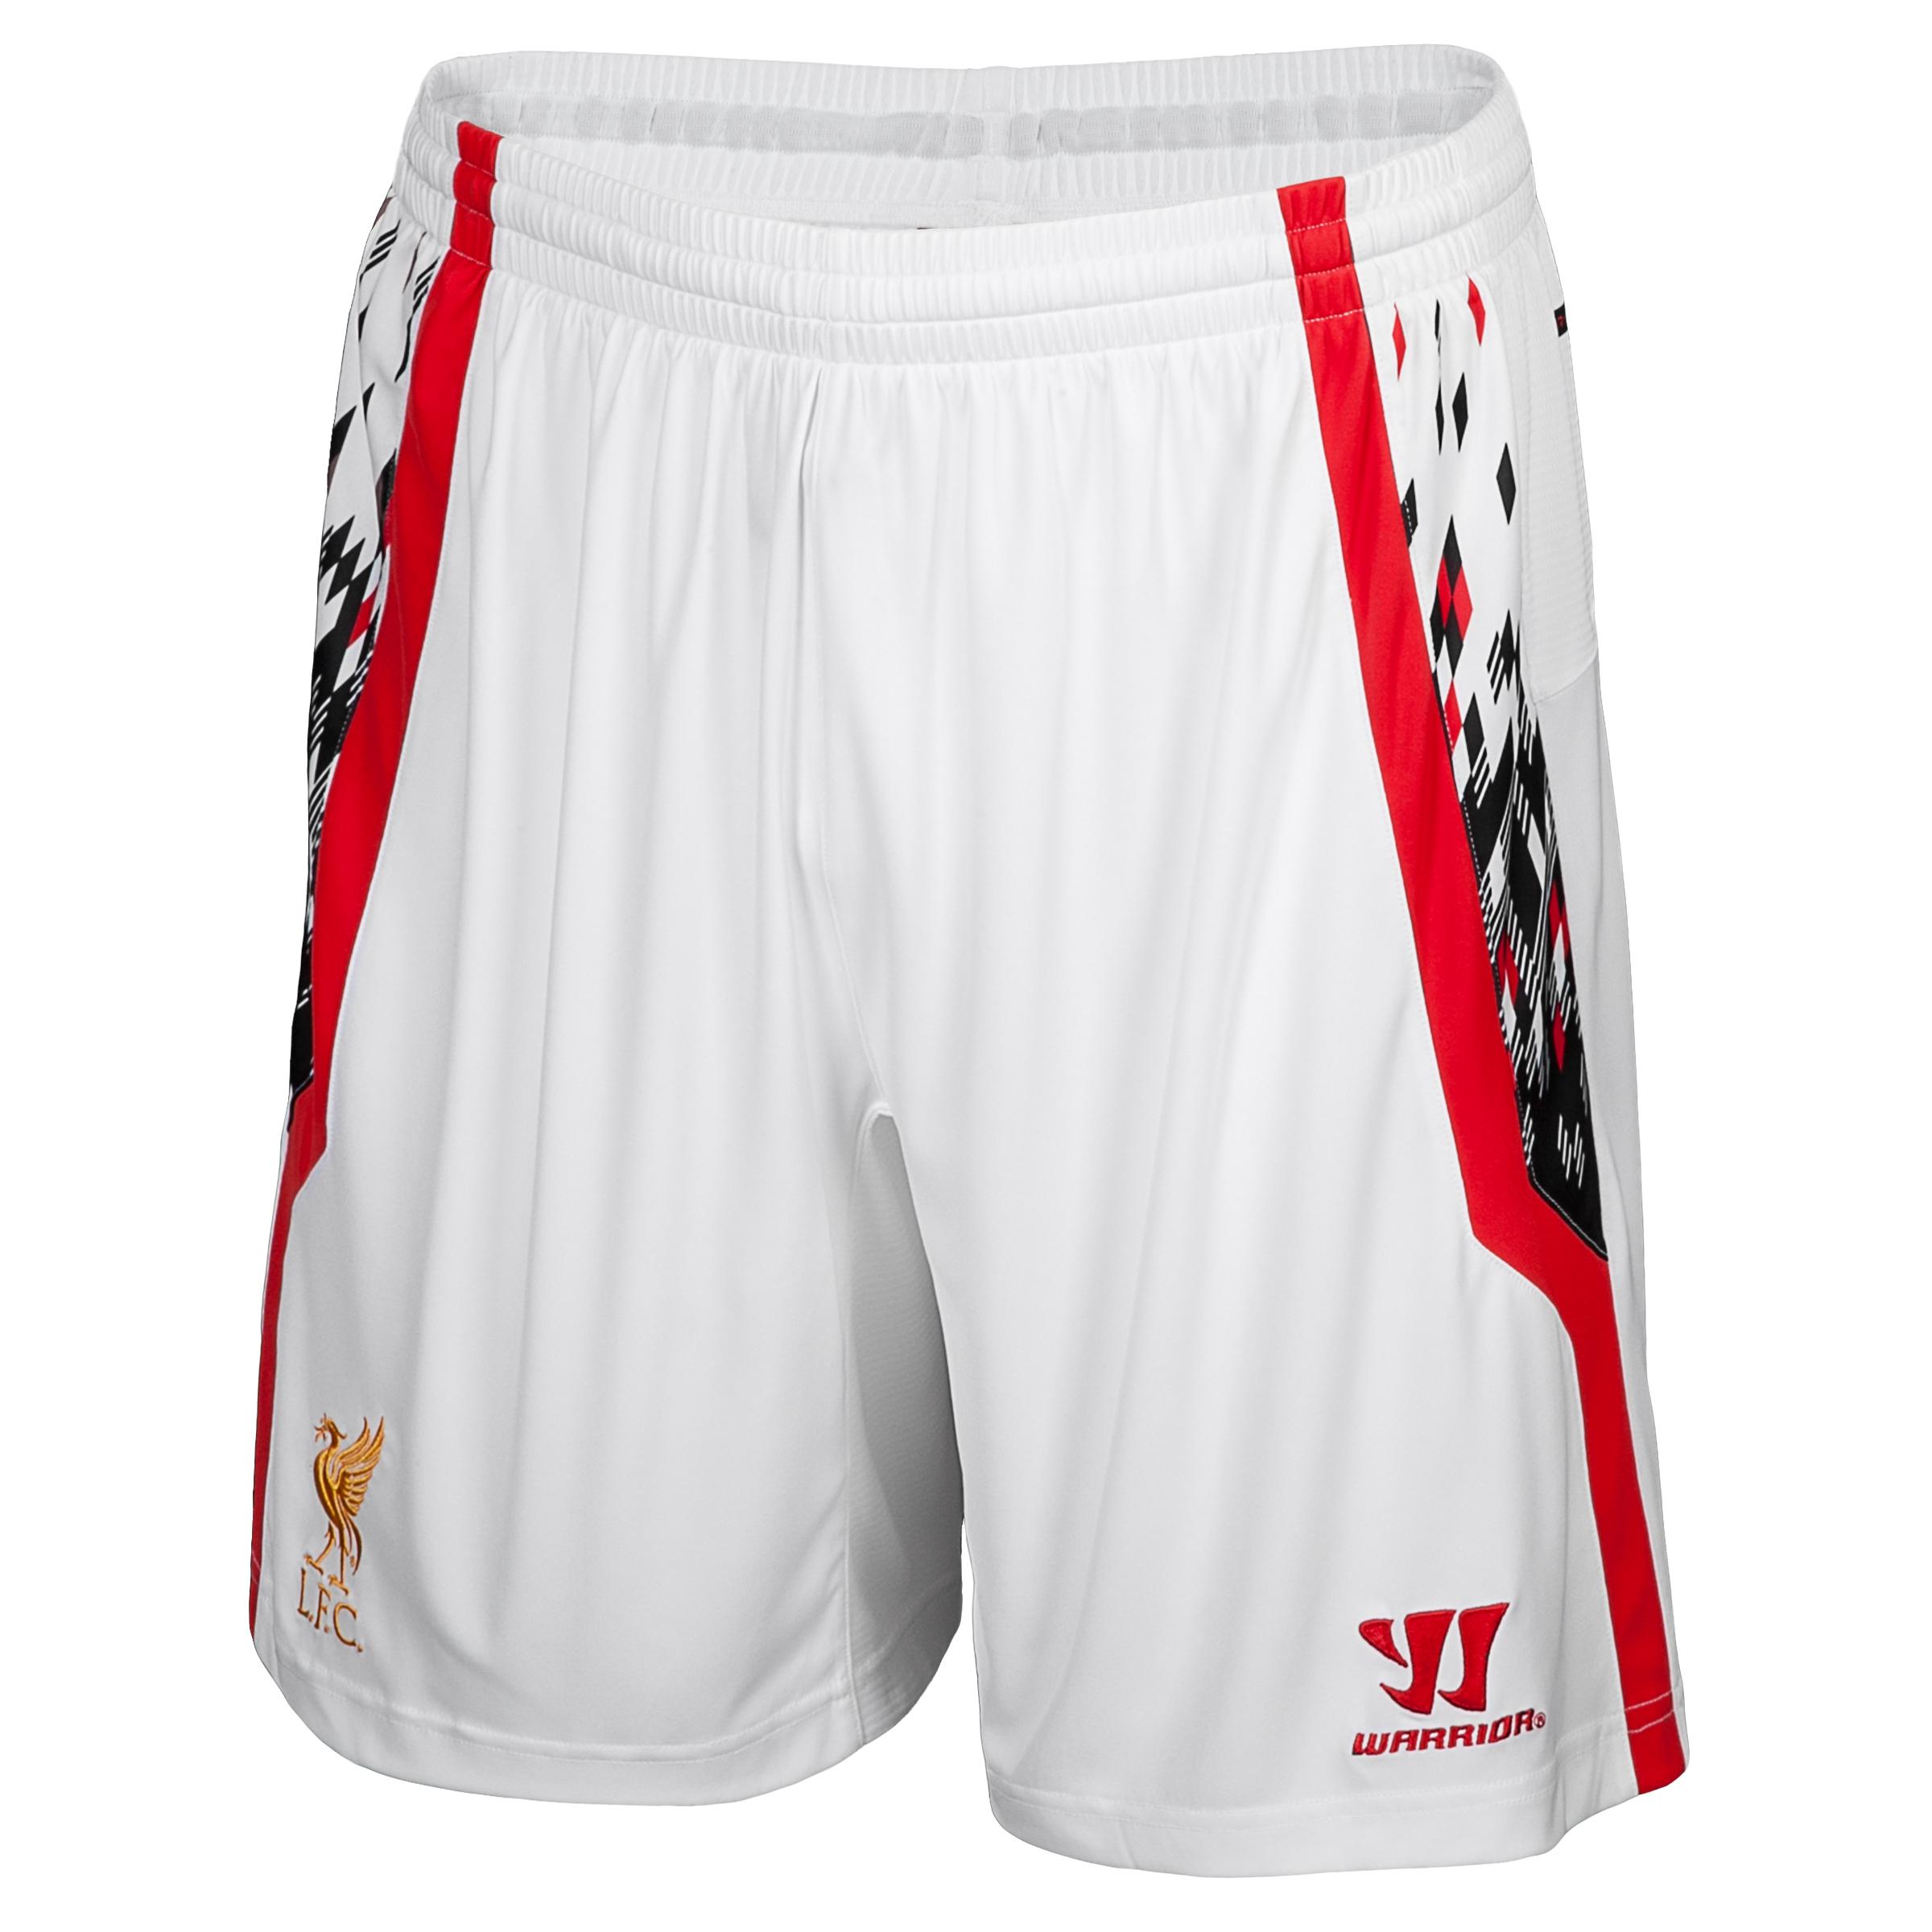 Liverpool Away Change Shorts 2013/14